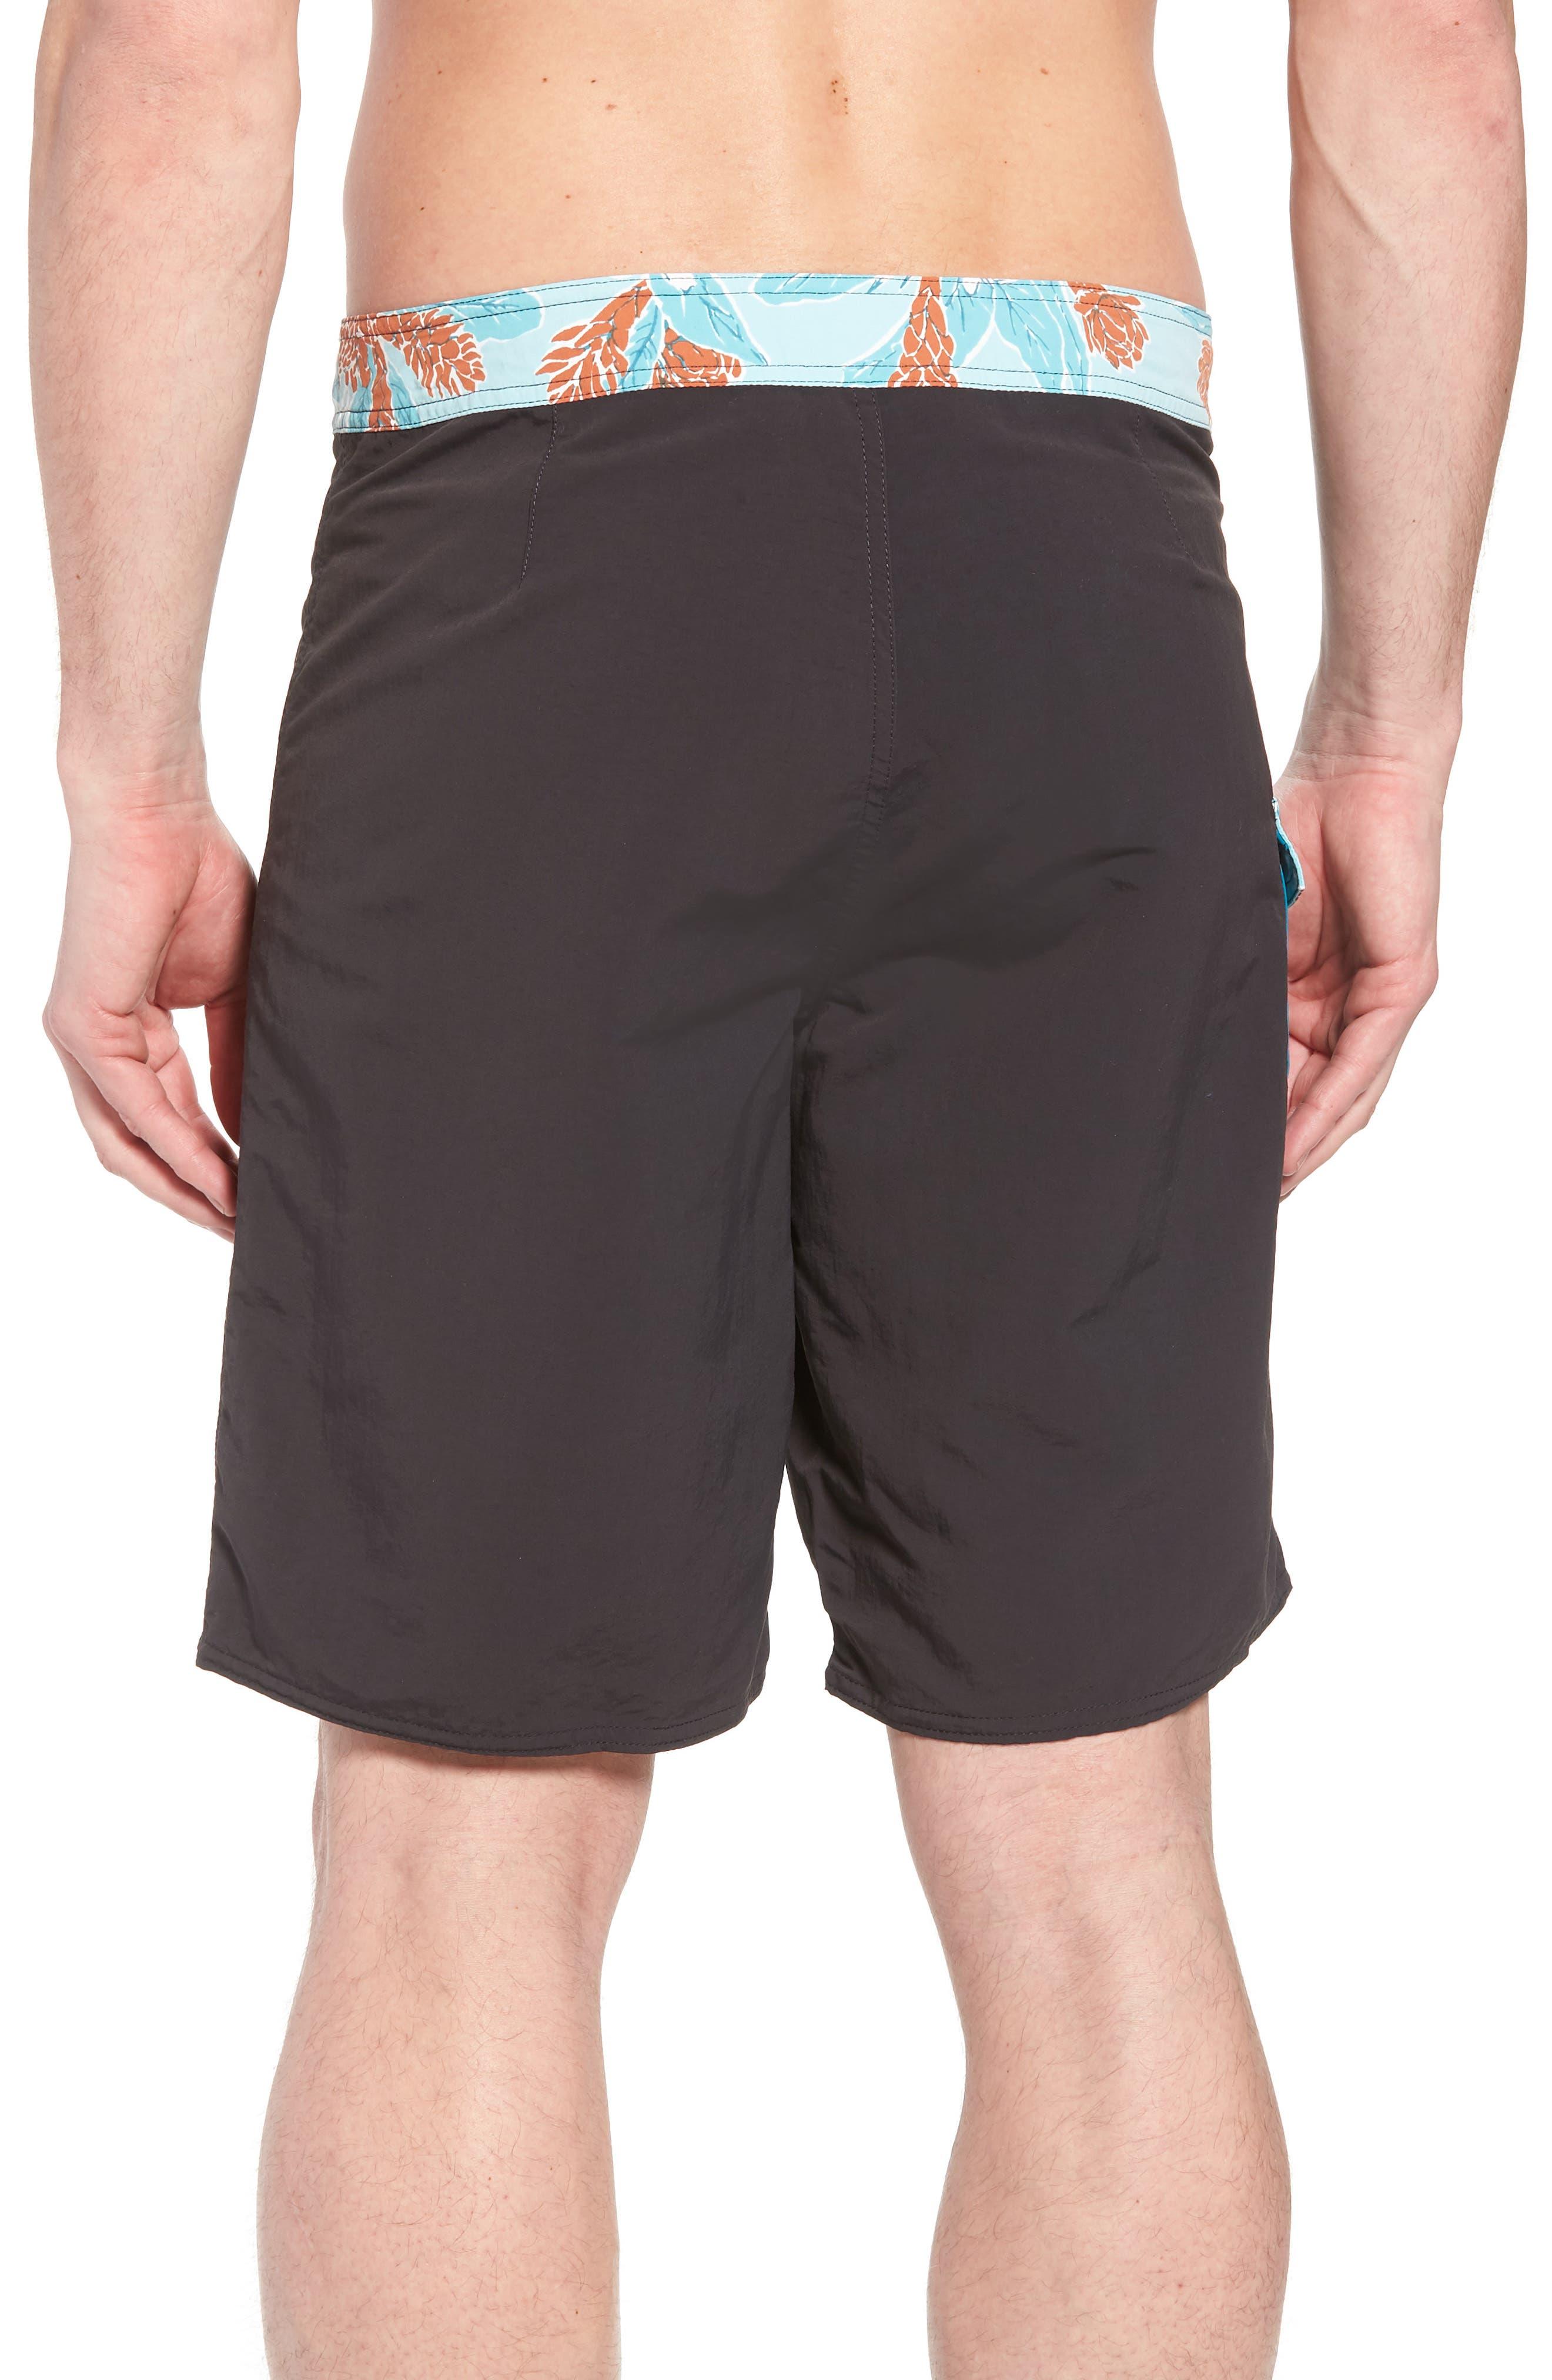 Wavefarer Board Shorts,                             Alternate thumbnail 2, color,                             001